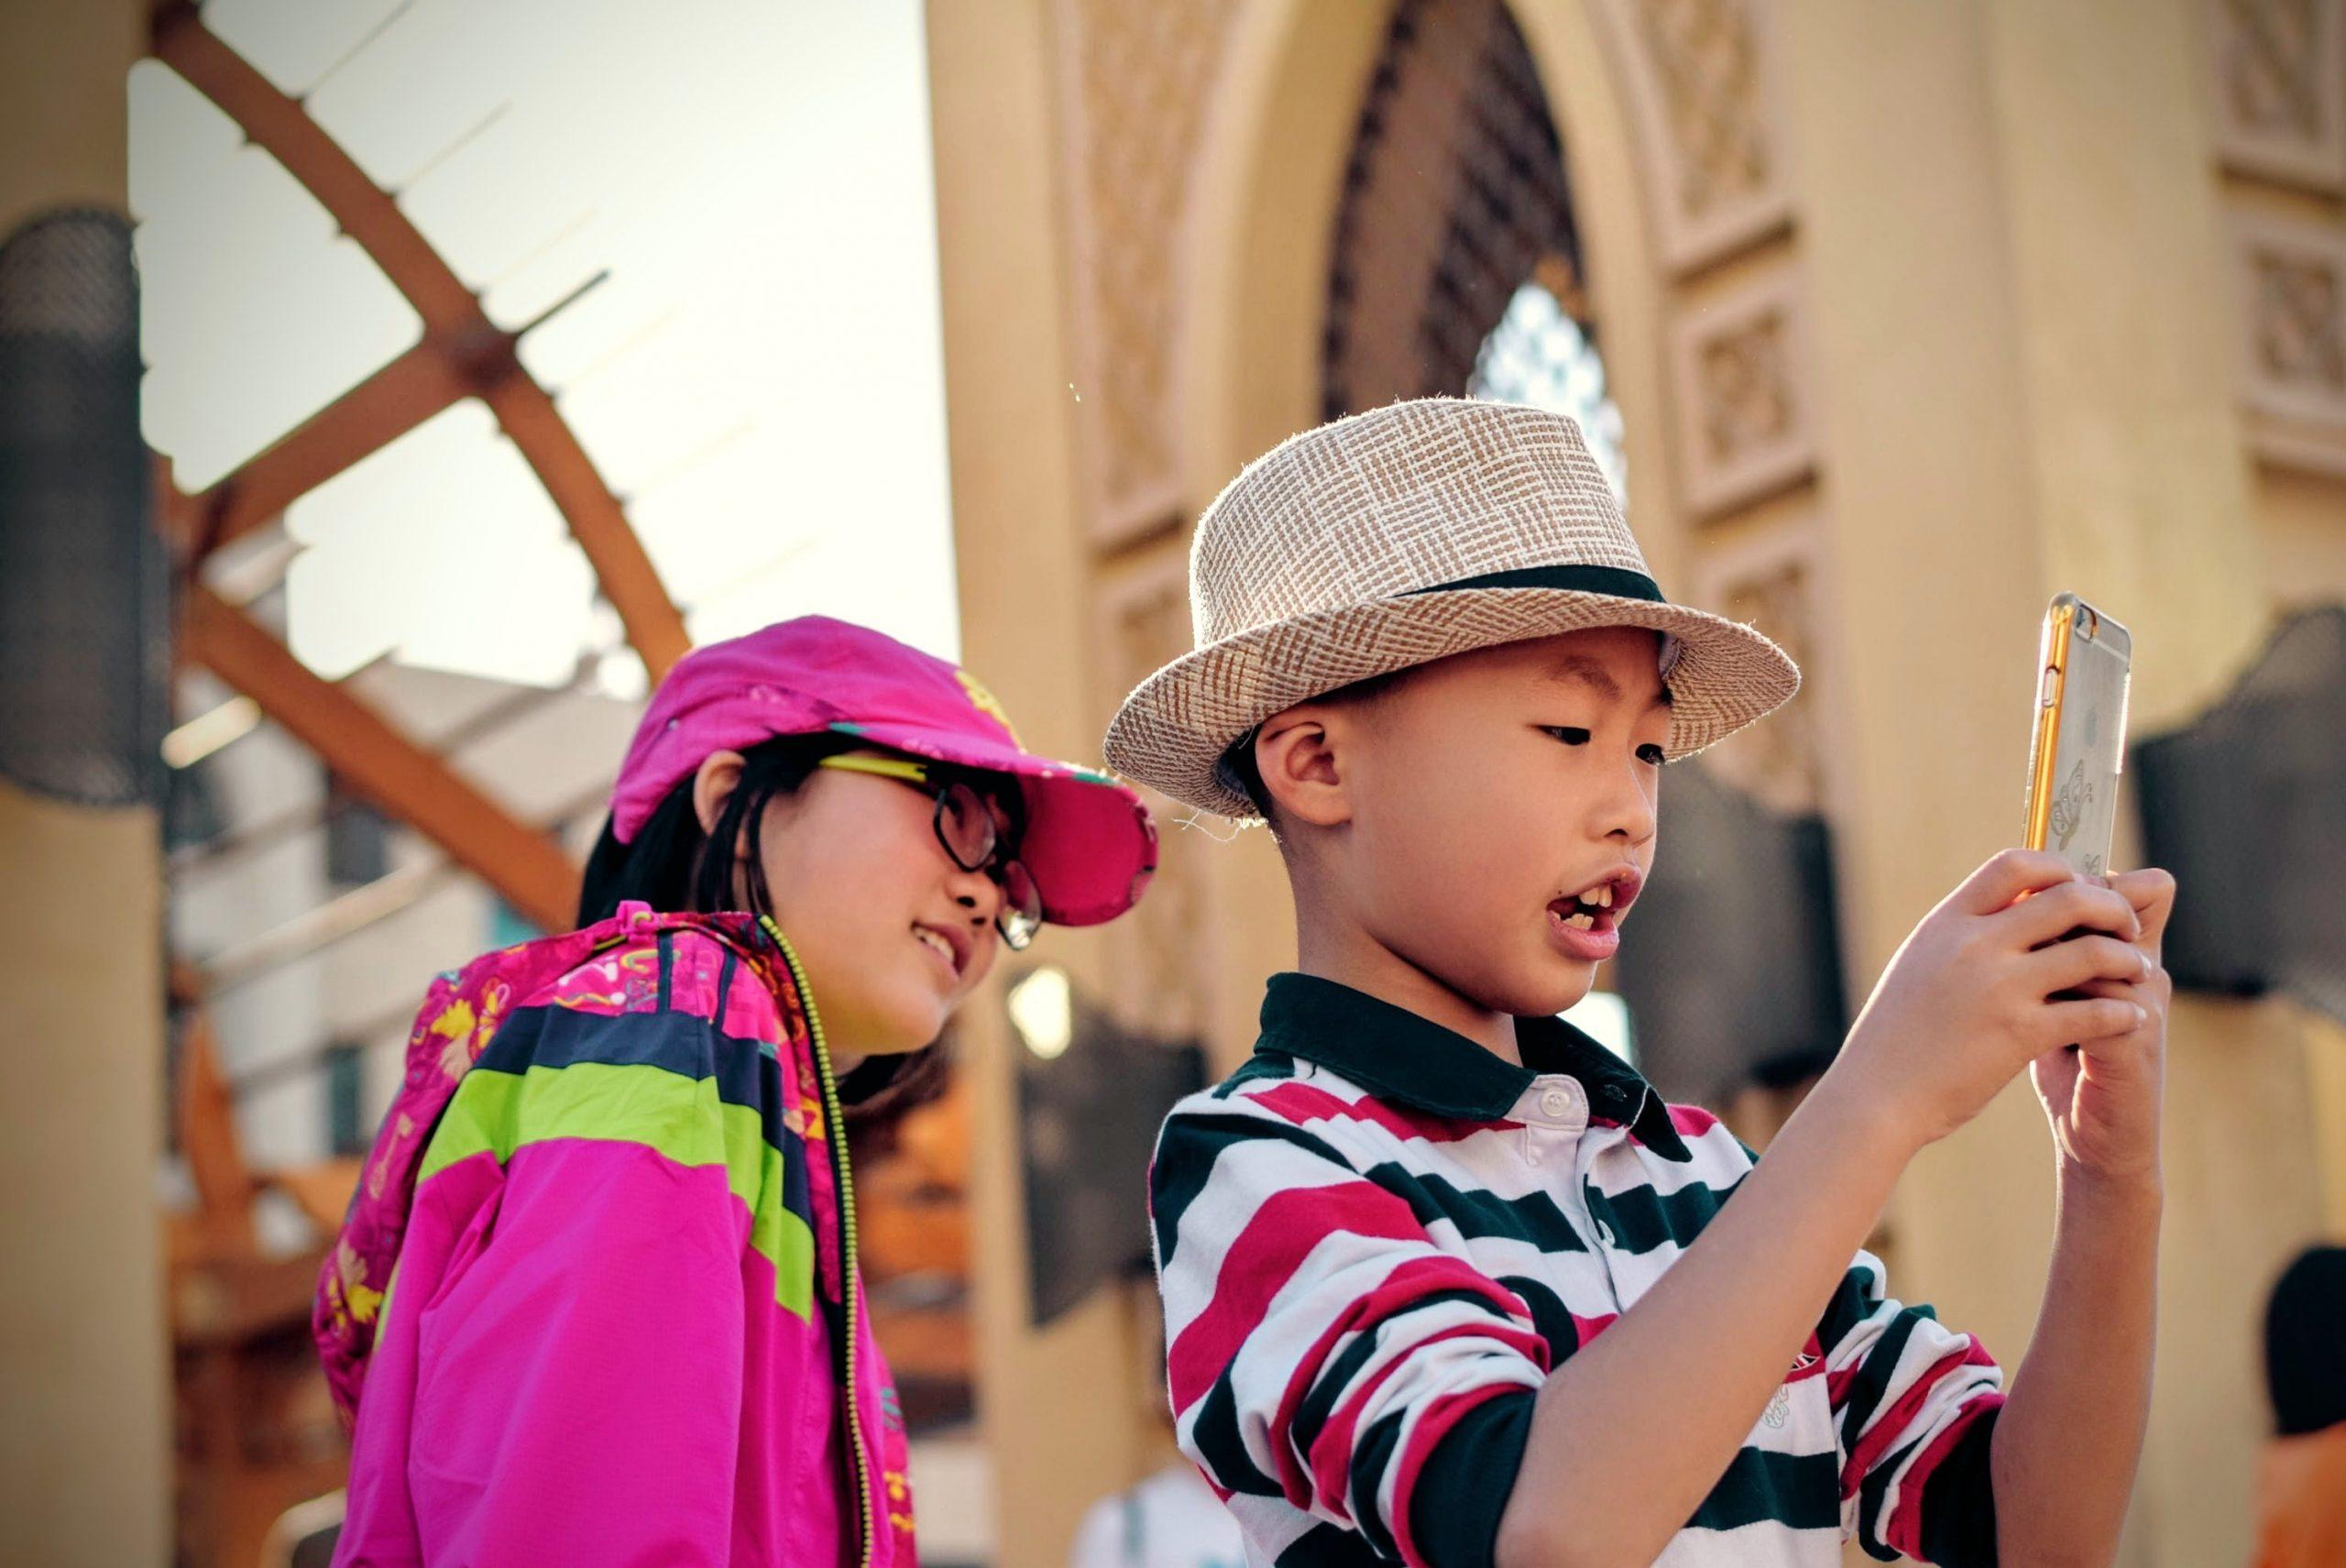 2 children using a phone